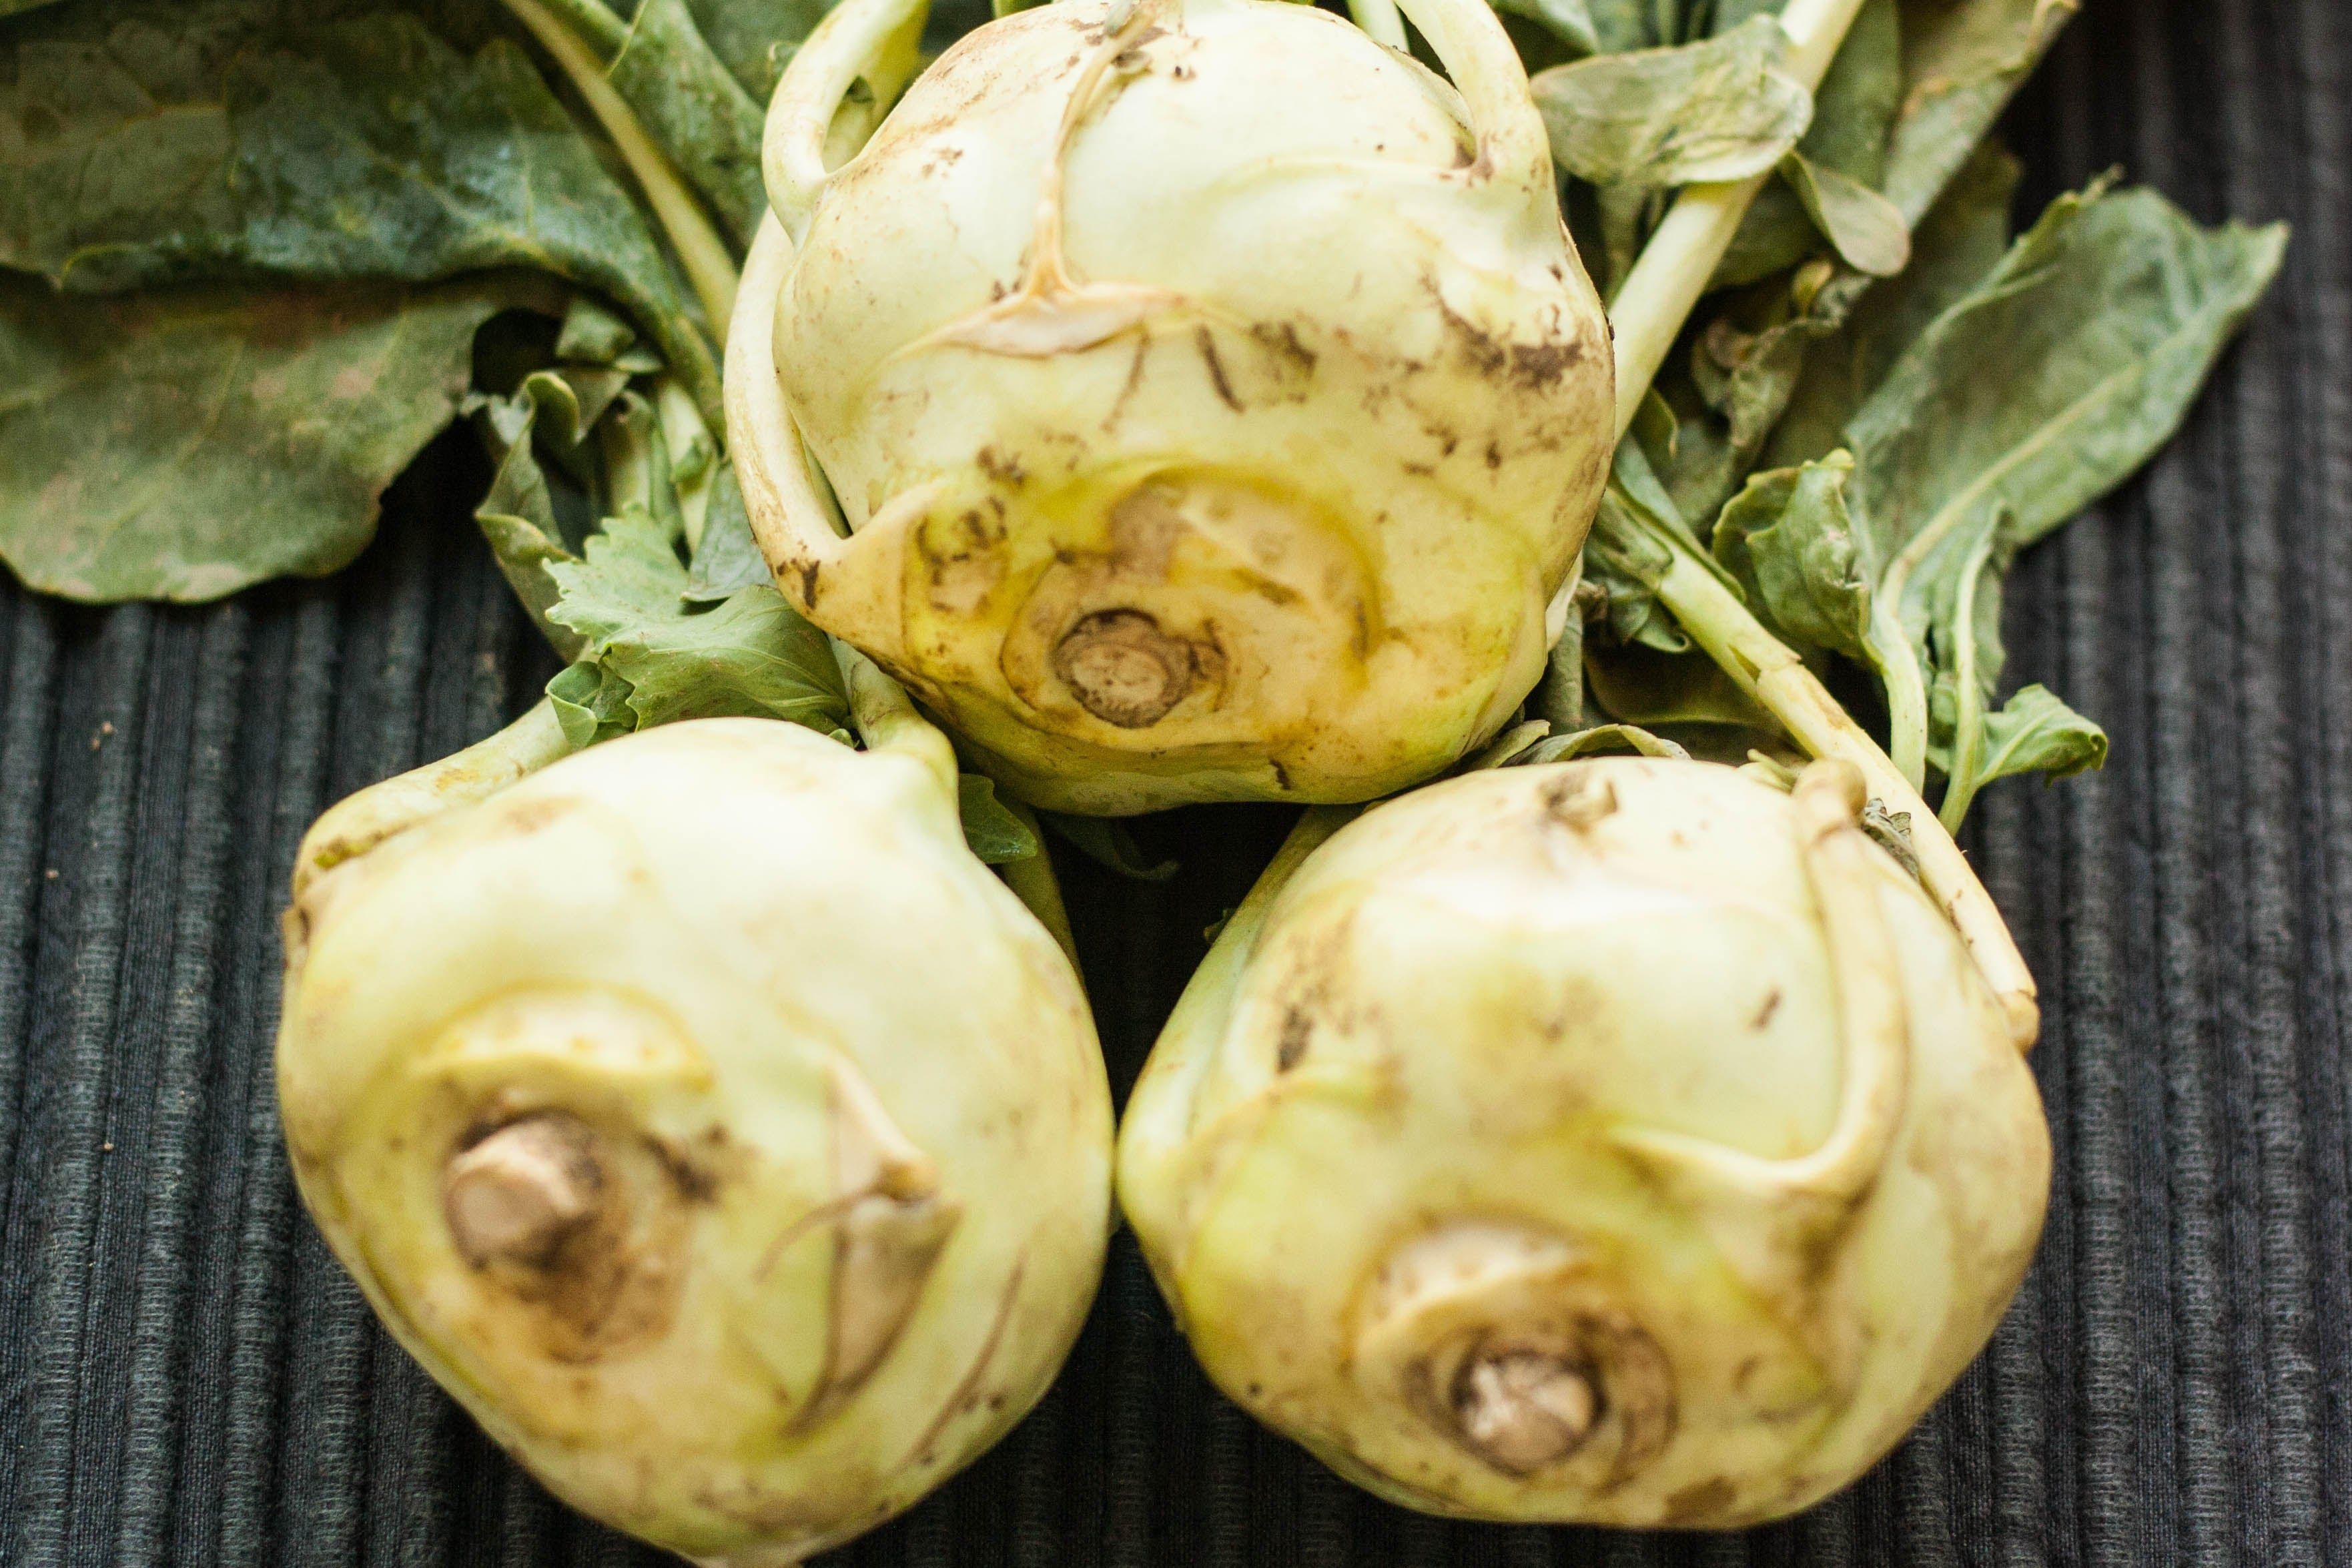 5 Tasty Ways to Prepare Kohlrabi — Tips from The Kitchn